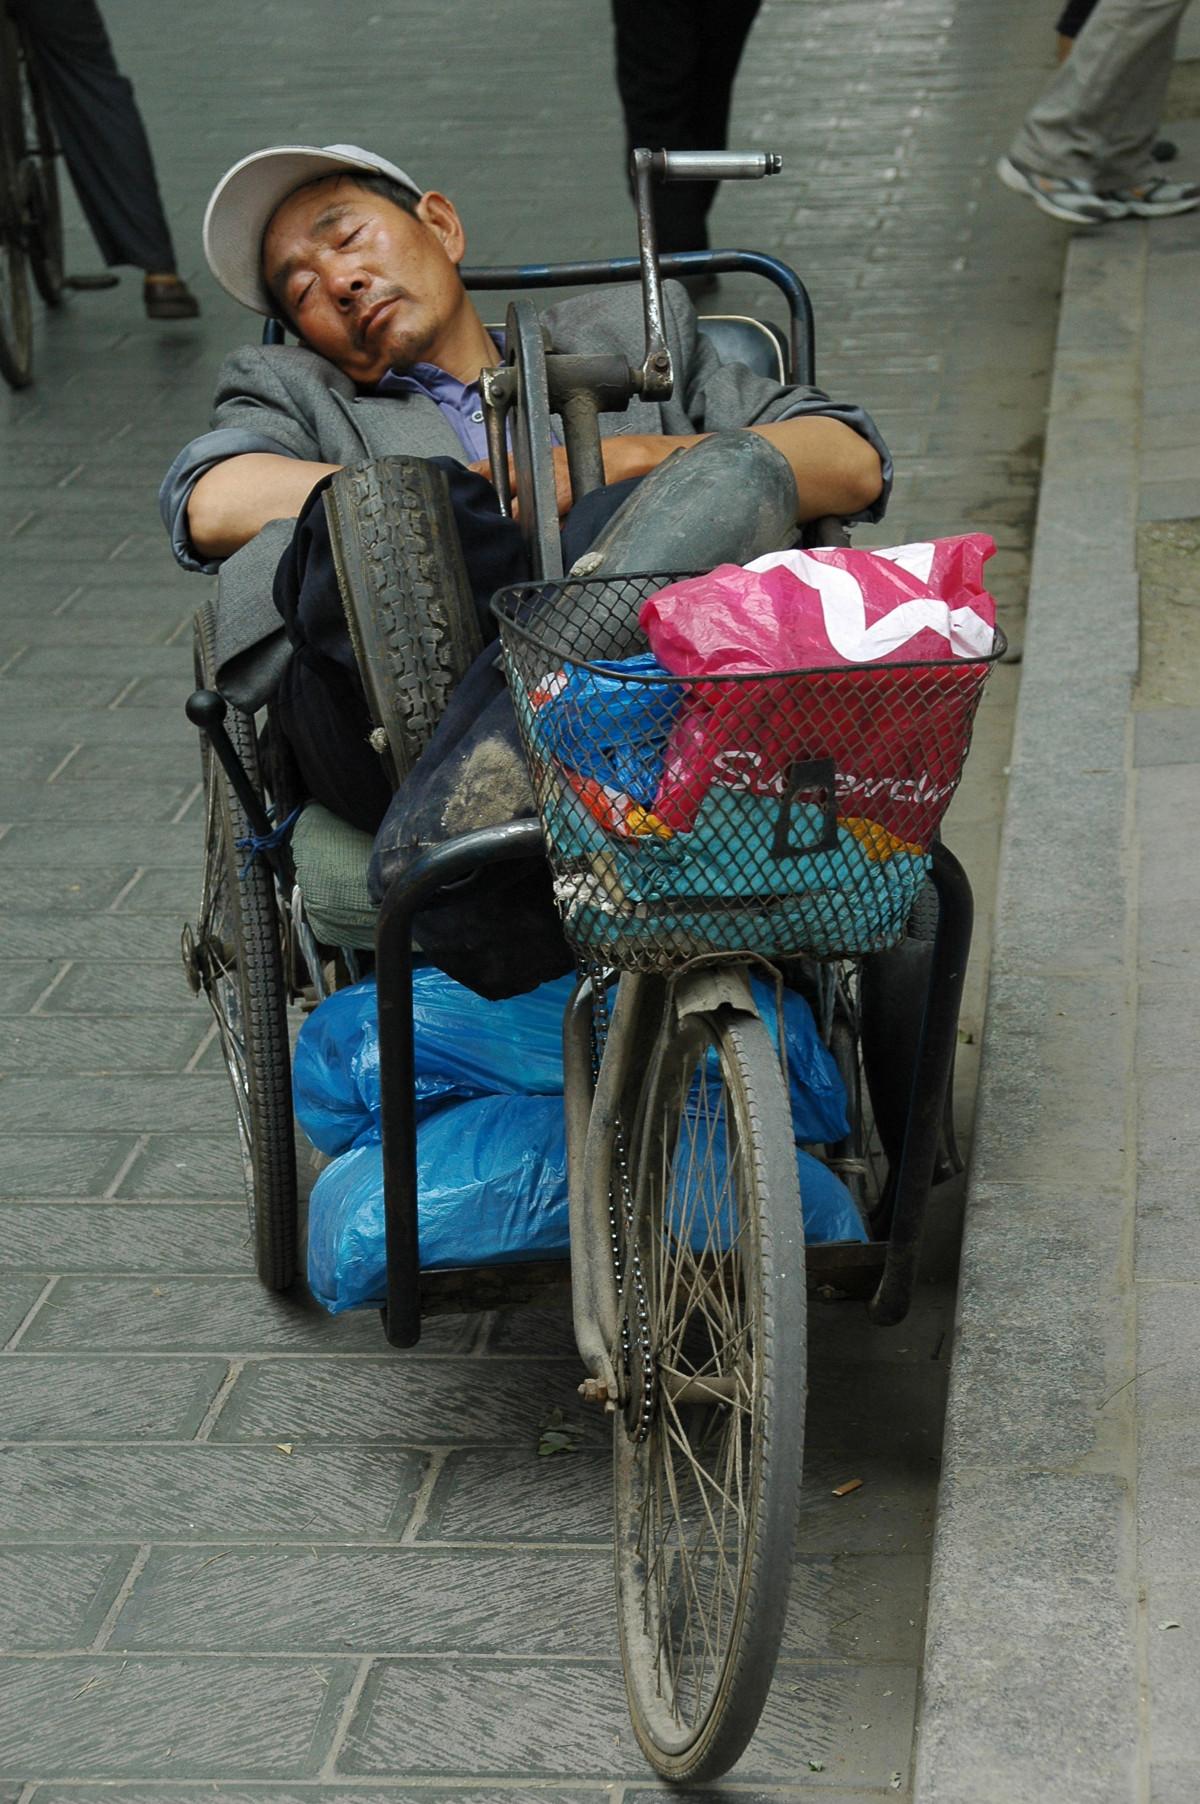 Free Images : street, bicycle, asphalt, vehicle, hat, park ...